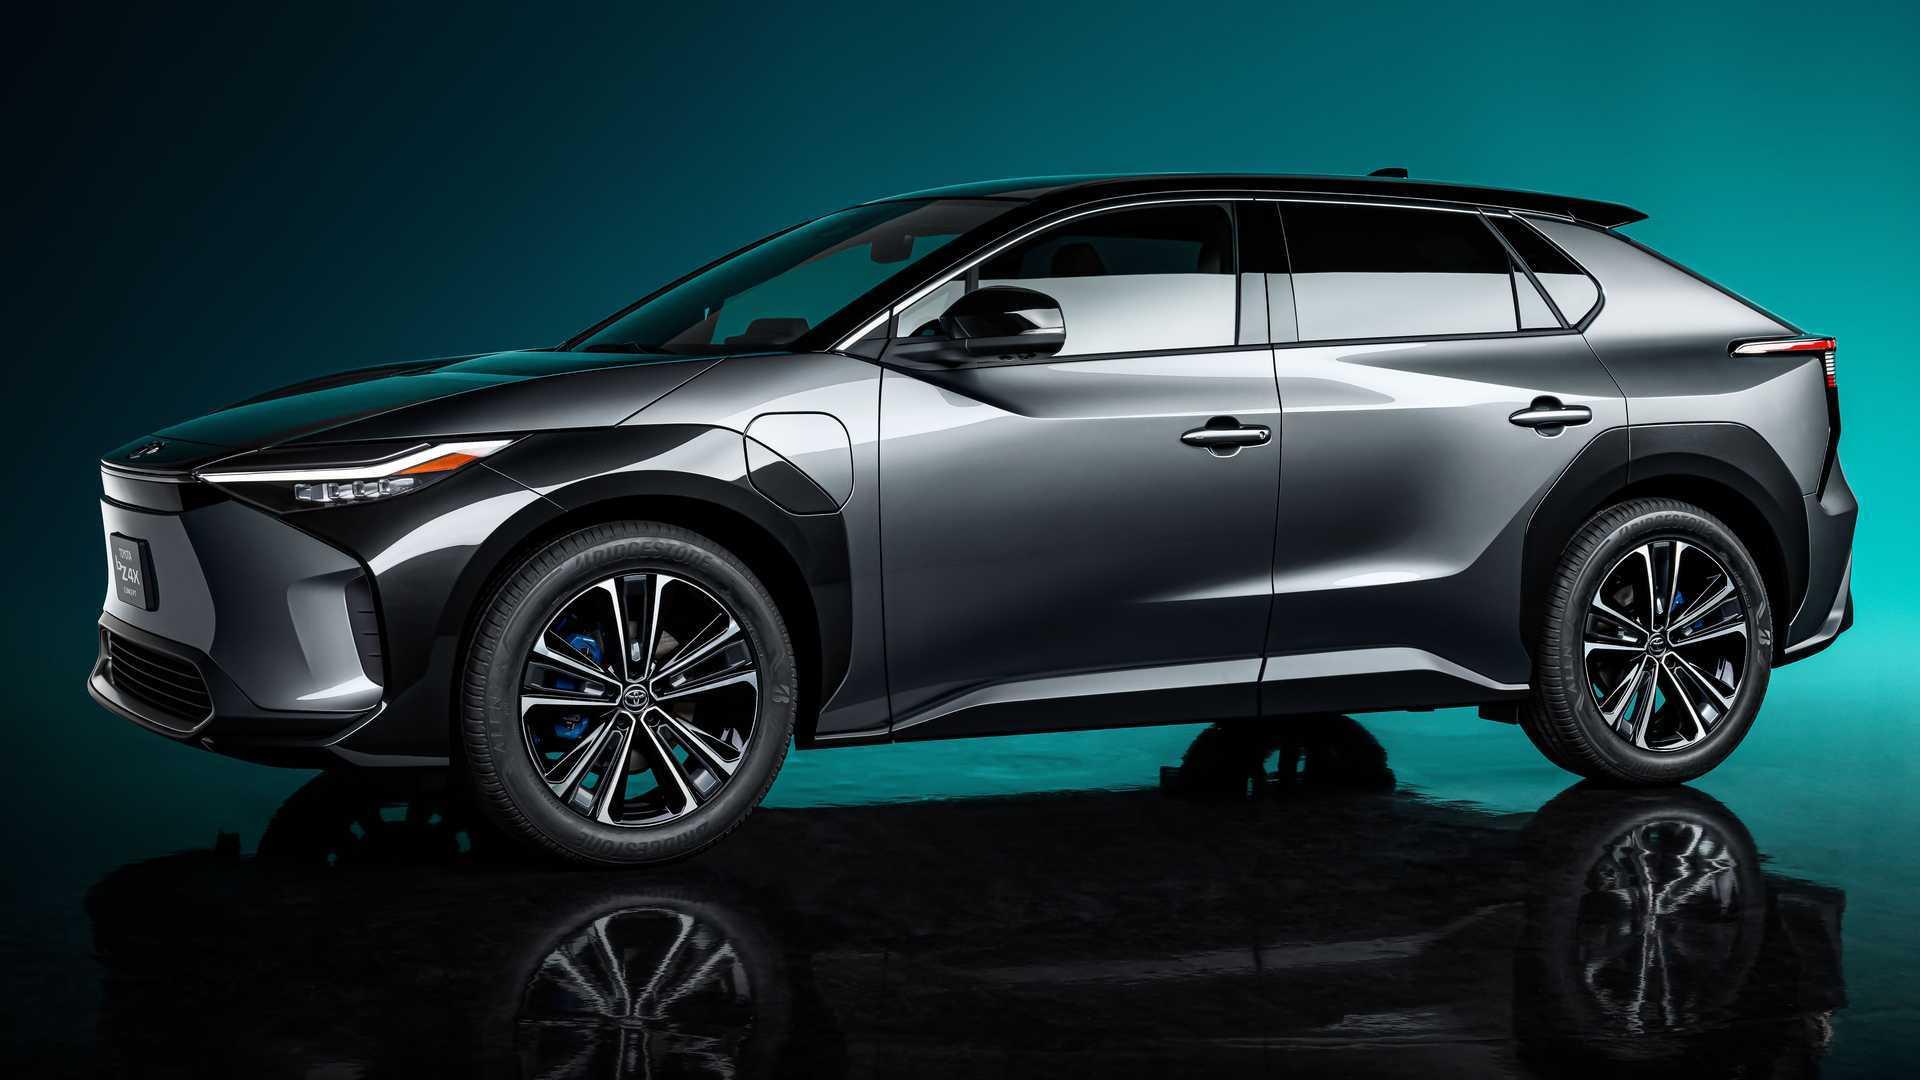 Toyota Reveals Electric SUV bZ4X Concept  image